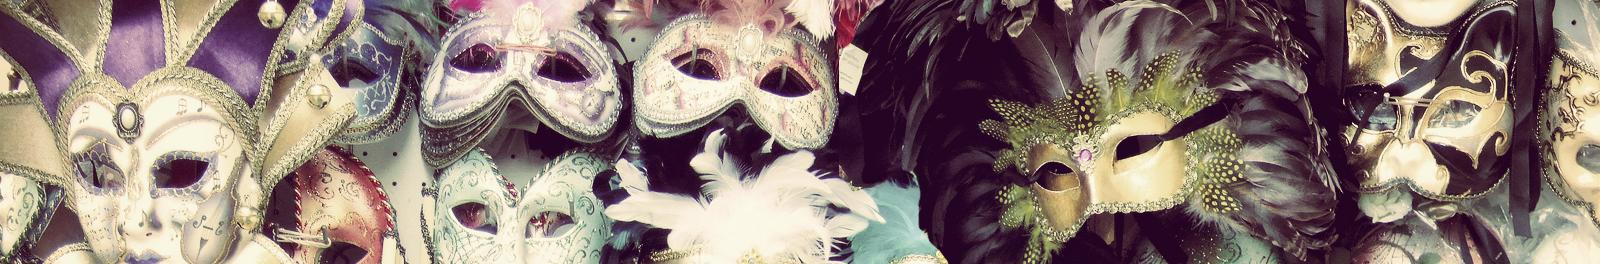 Arriba el Carnaval!